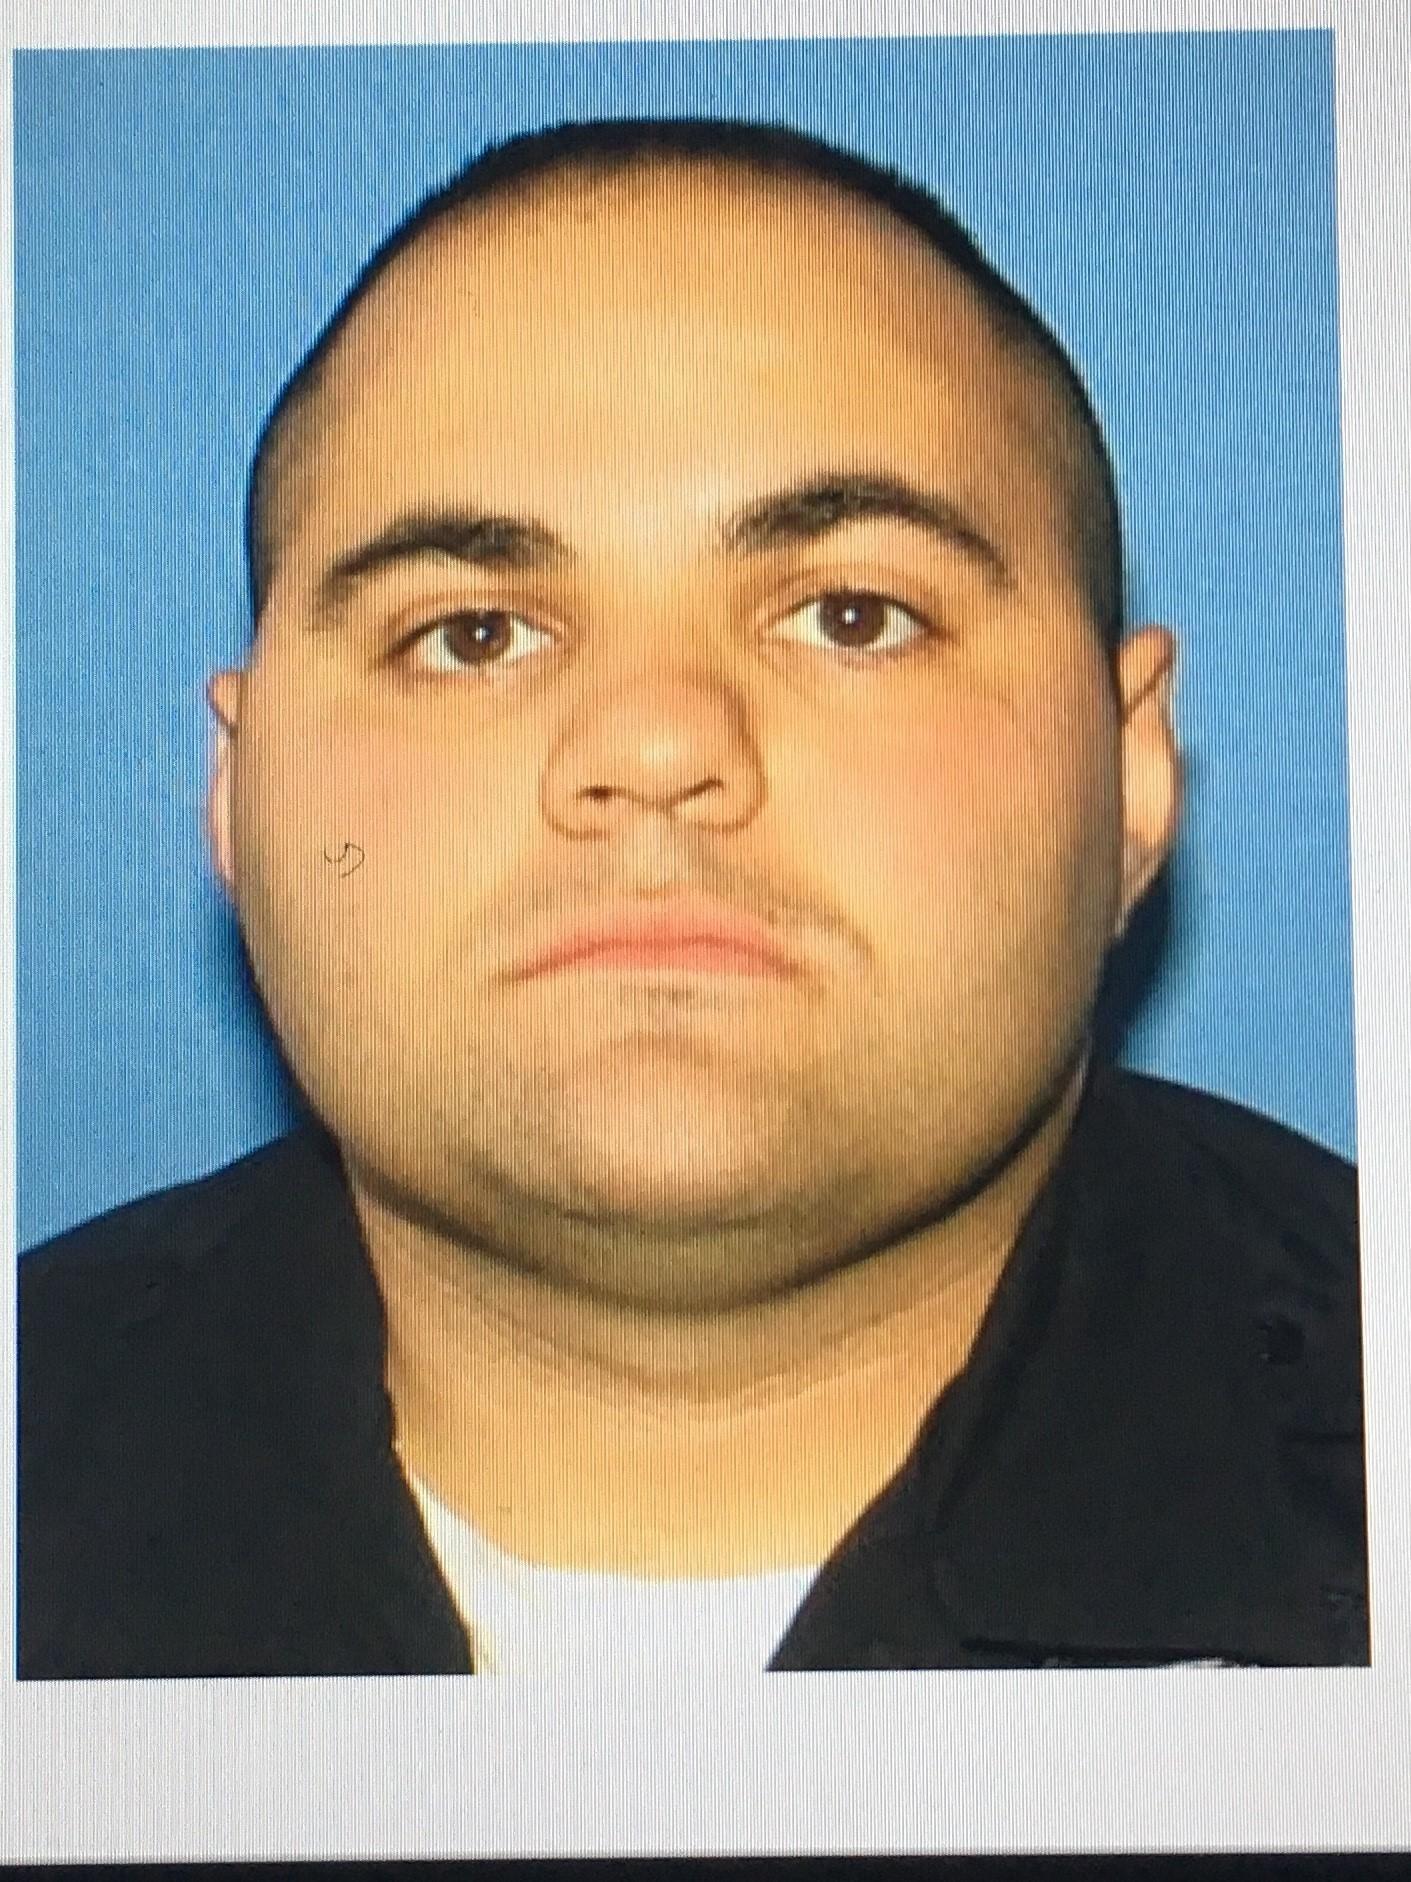 Cook County Sheriff's deputy killed in head-on crash on Southwest Side